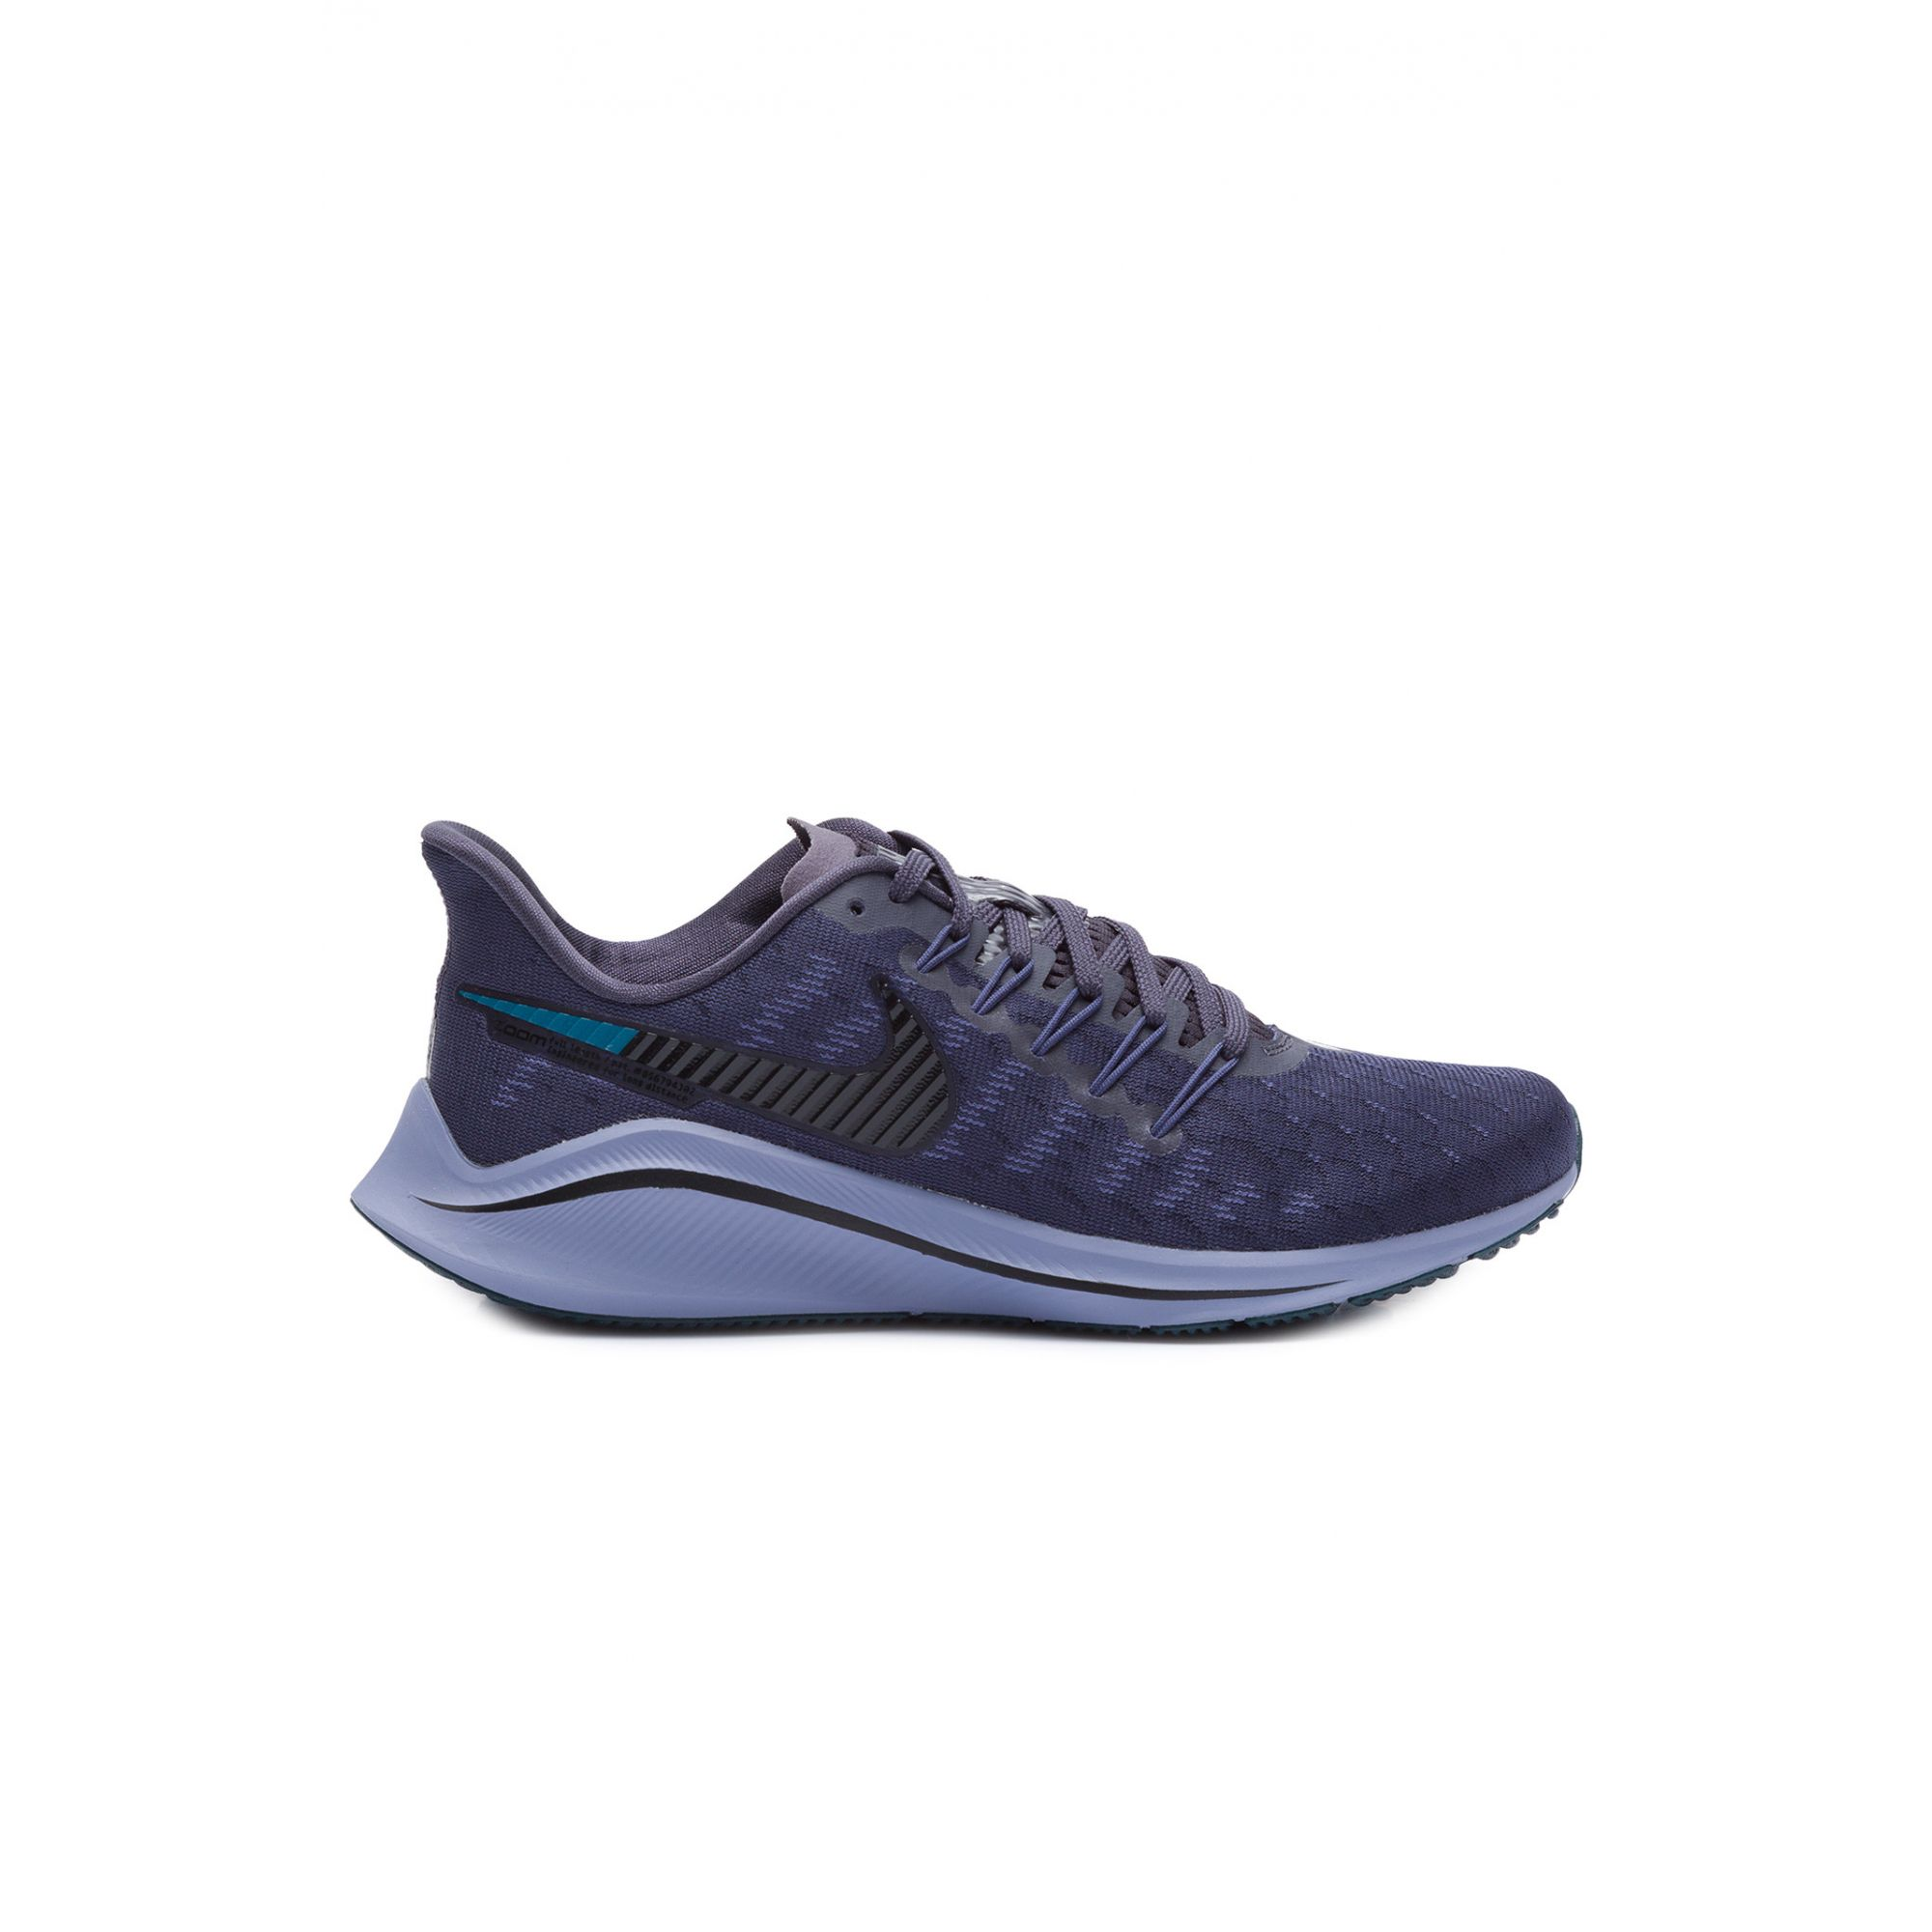 Tênis Nike Air Zoom Vomero 14 Roxo